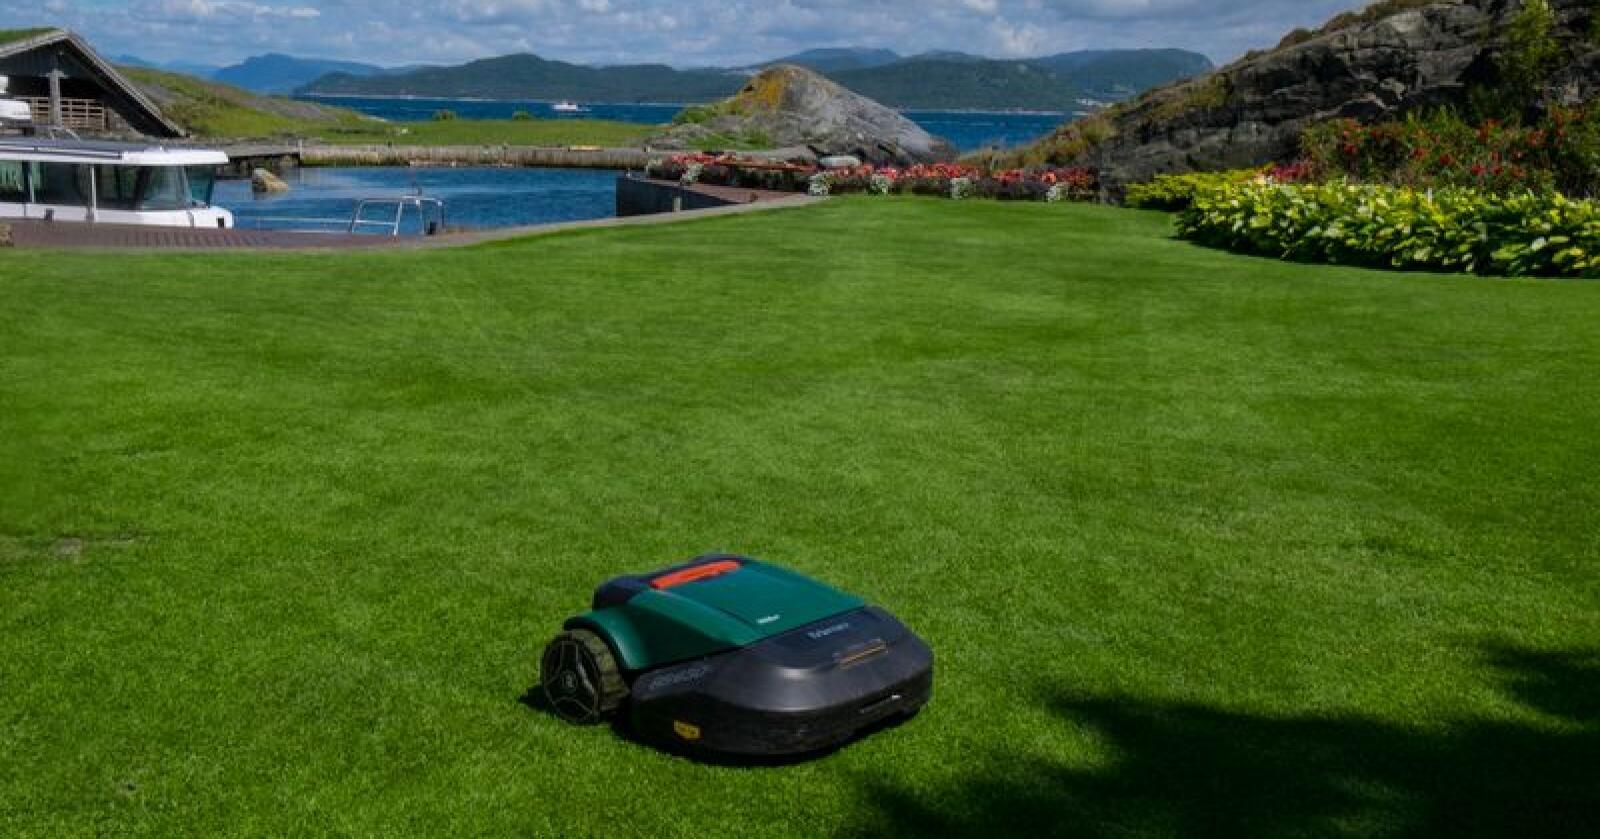 Med en robotgressklipper slipper du å klippe gresset selv, men ifølge Norsk entomologisk forening kan slike gressklippere skade det biologiske mangfoldet. Foto: Vidar Ruud / NTB scanpix